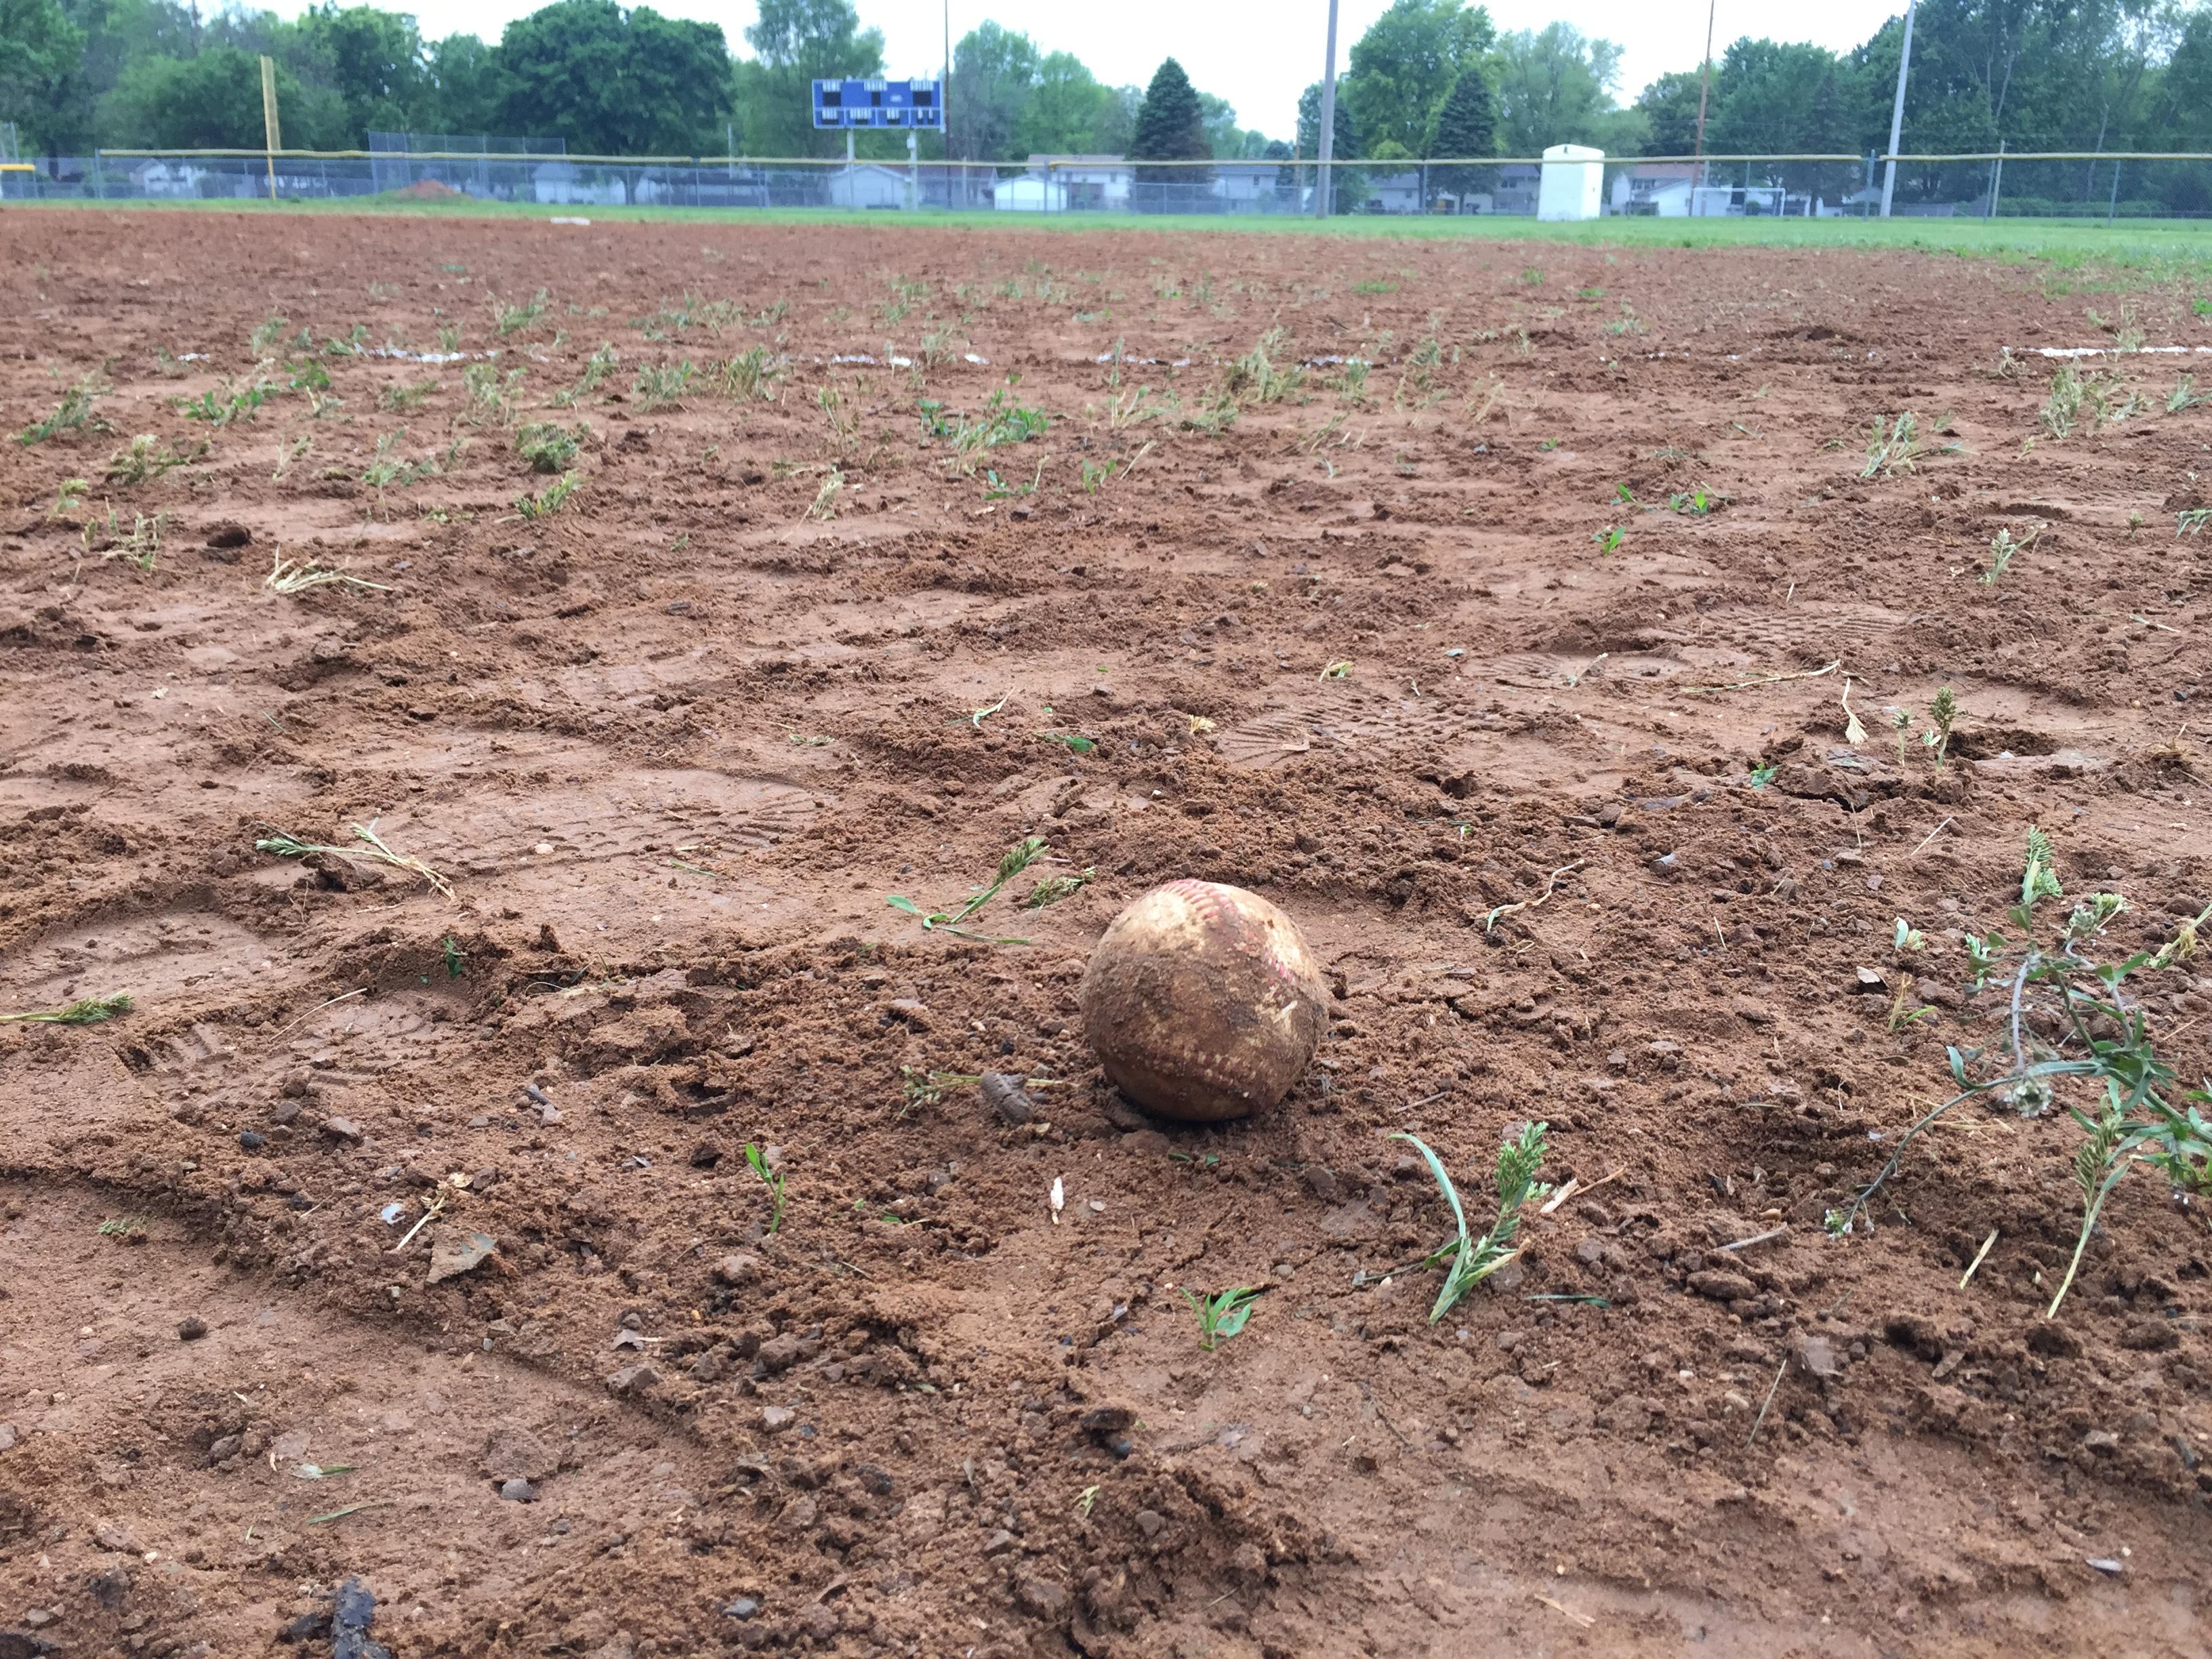 HTTP://217DENT.COM Got Dents Baseball team Springfield, IL. First Game against Riverton Illinois